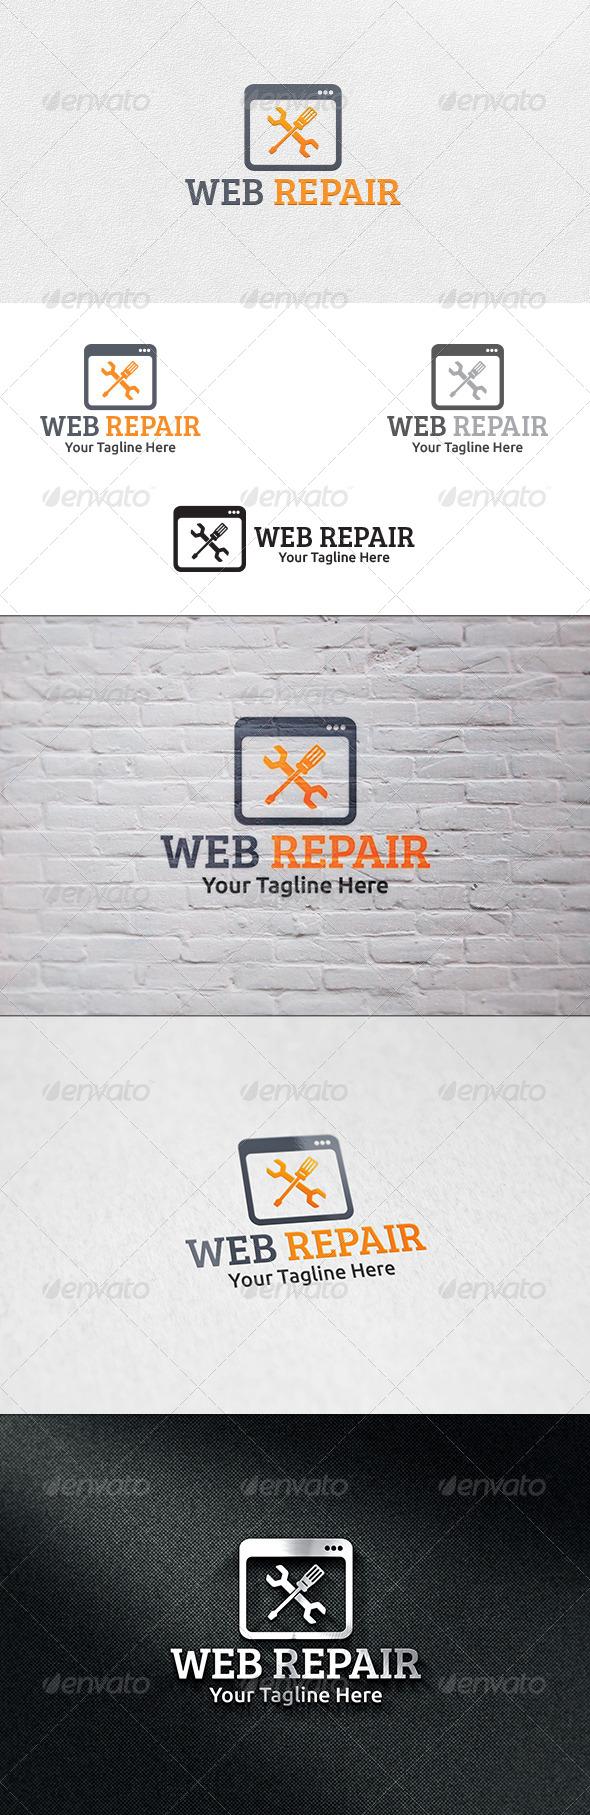 GraphicRiver Web Repair Logo Template 6703561